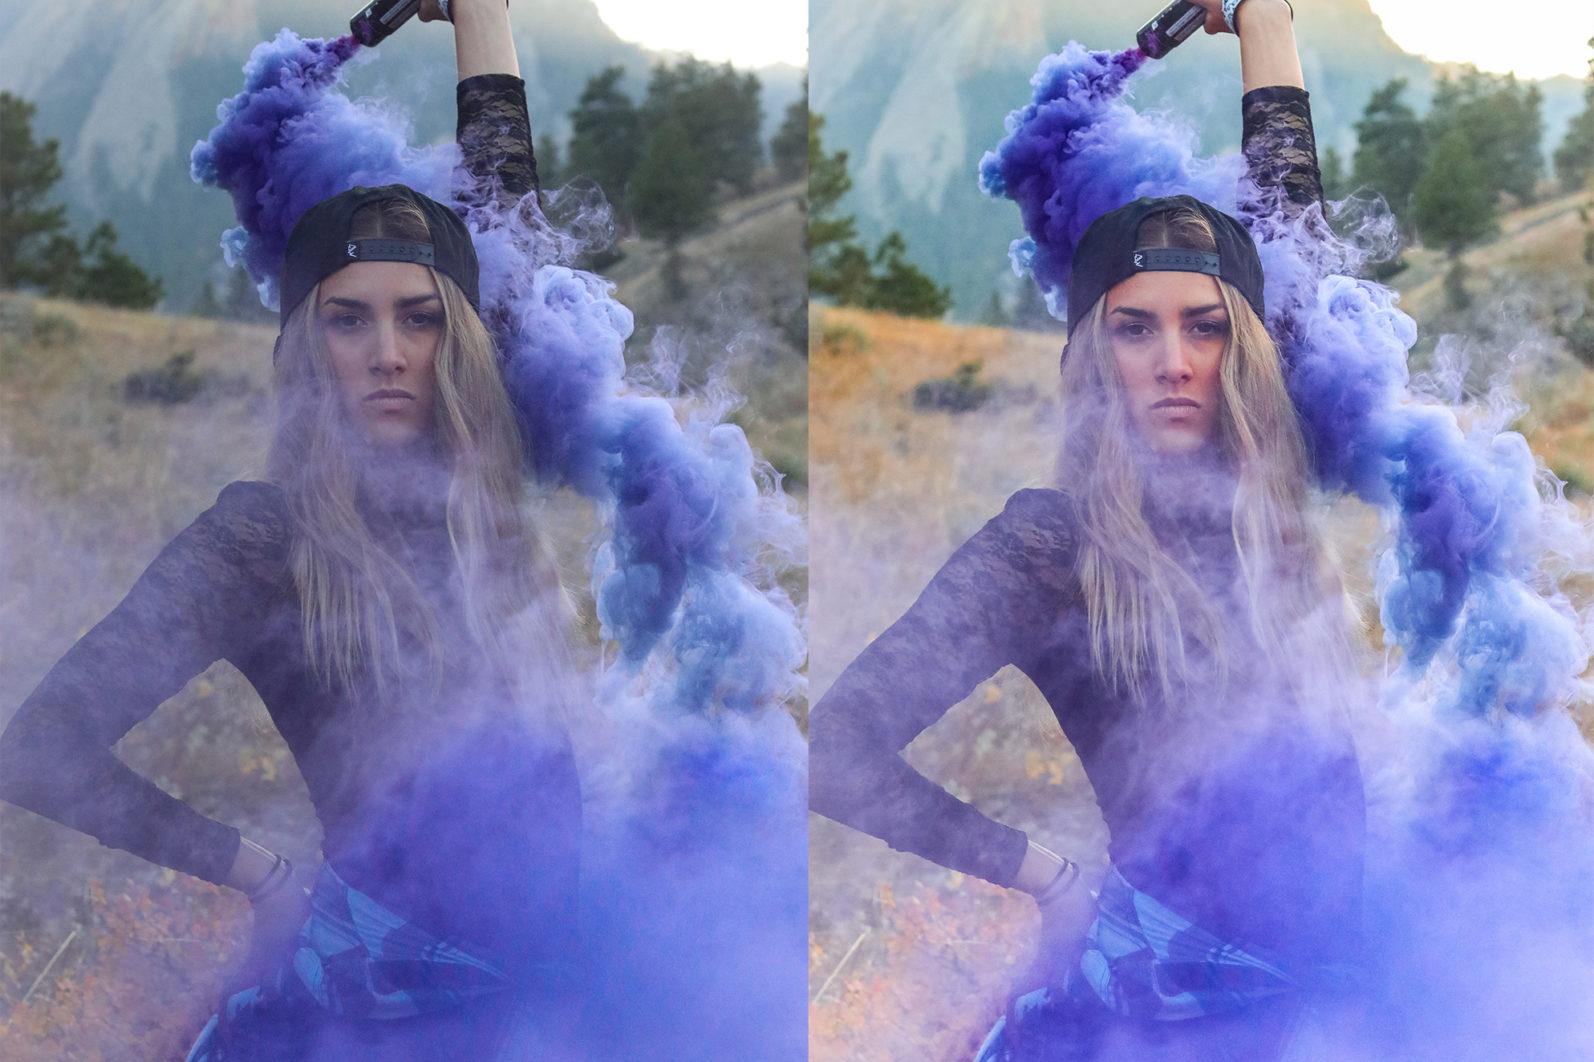 12 Smoke Bomb Lightroom Presets to enhance your Smoke Bomb Photoshoots - Preview 10 3 -